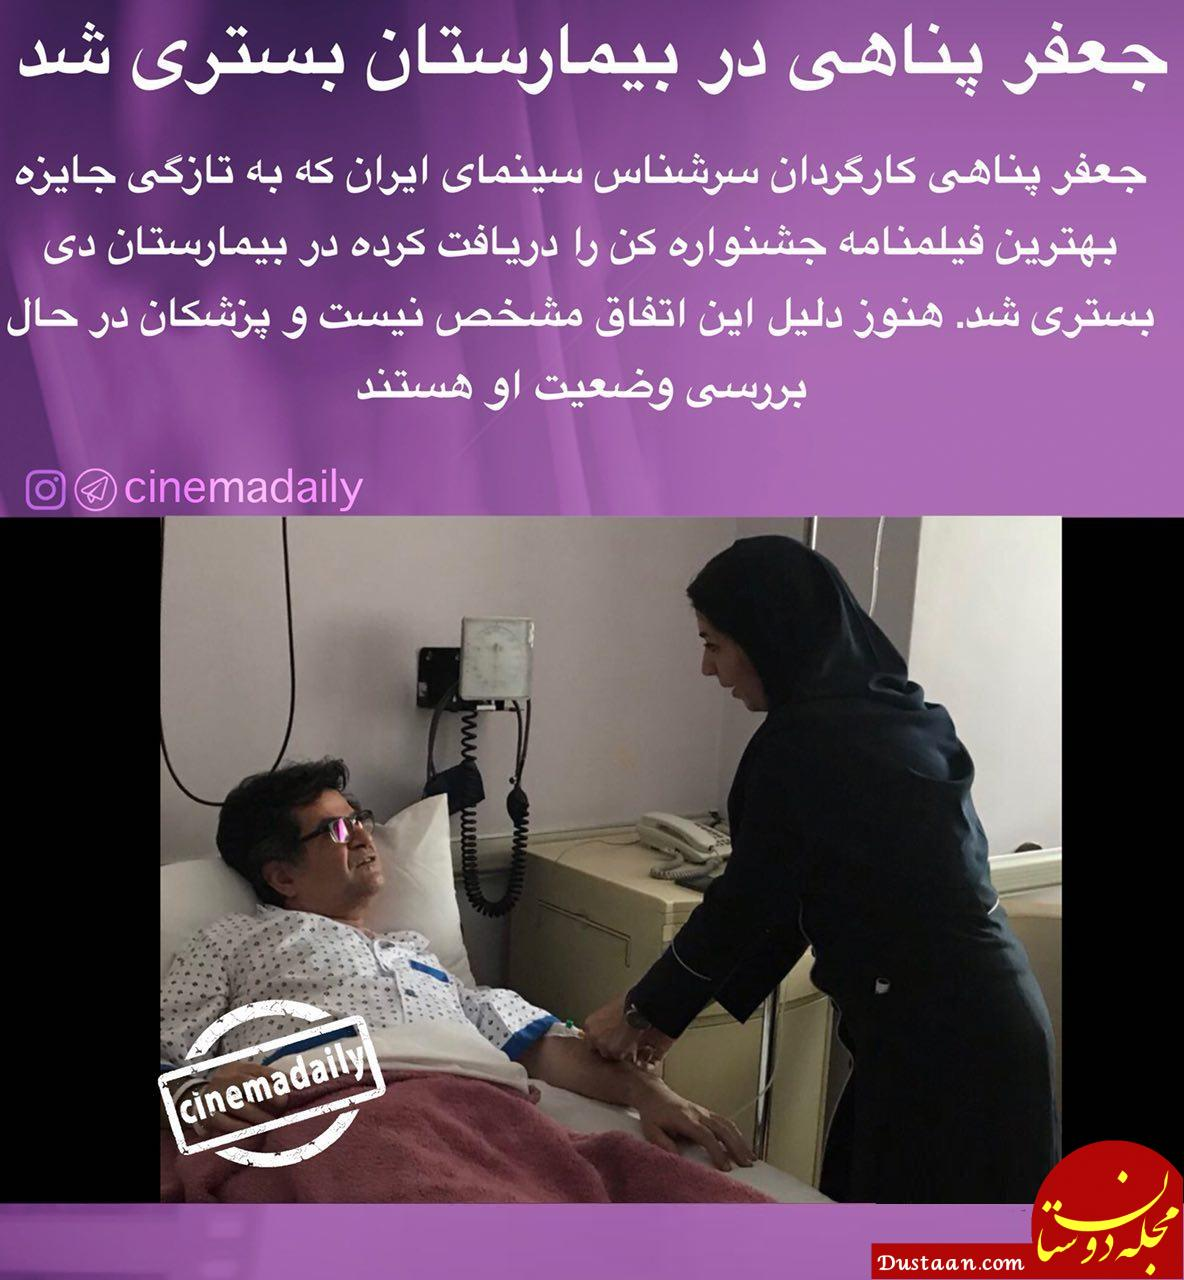 www.dustaan.com جعفر پناهی در بیمارستان بستری شد +عکس